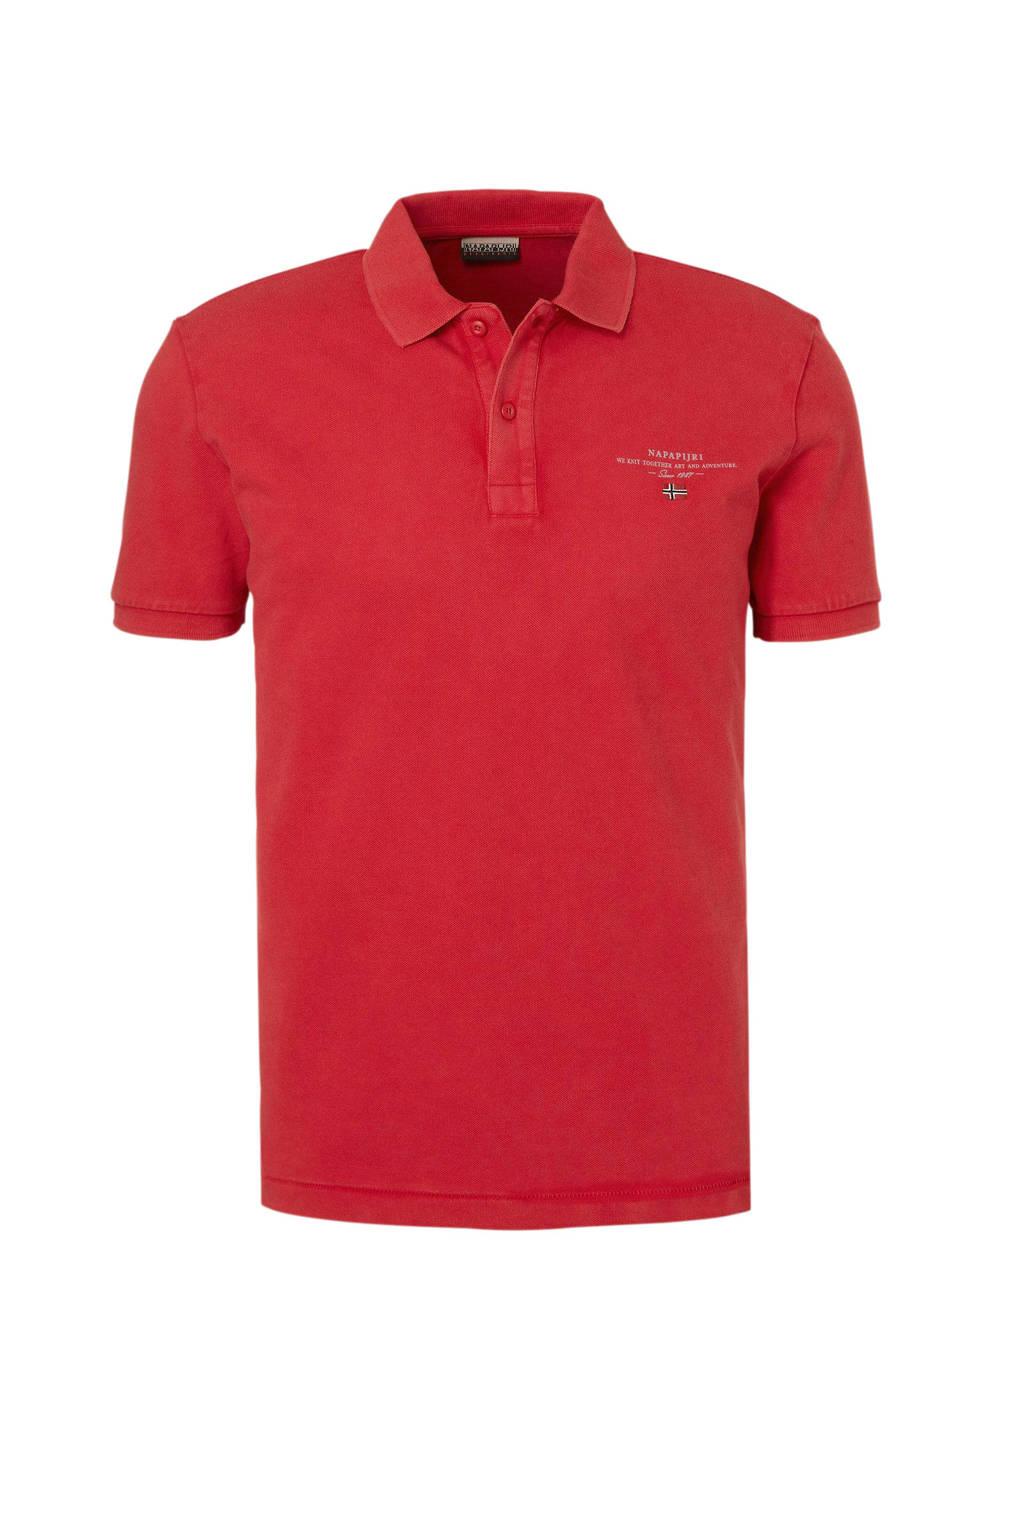 Napapijri polo rood, Rood